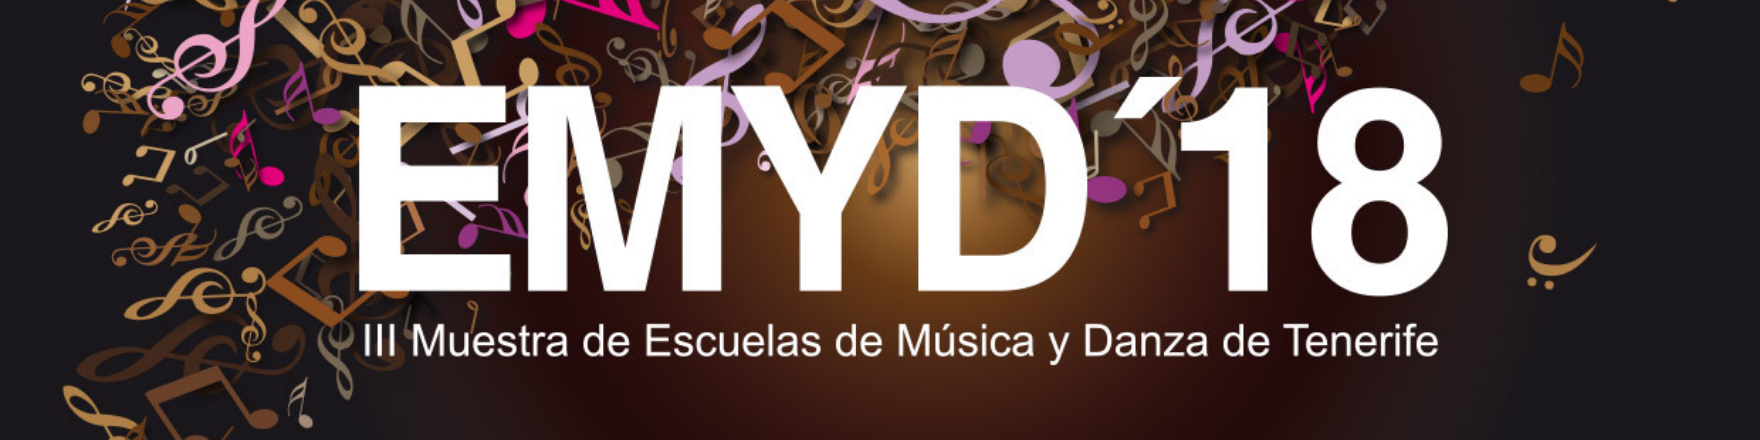 emyd2018 cabecera